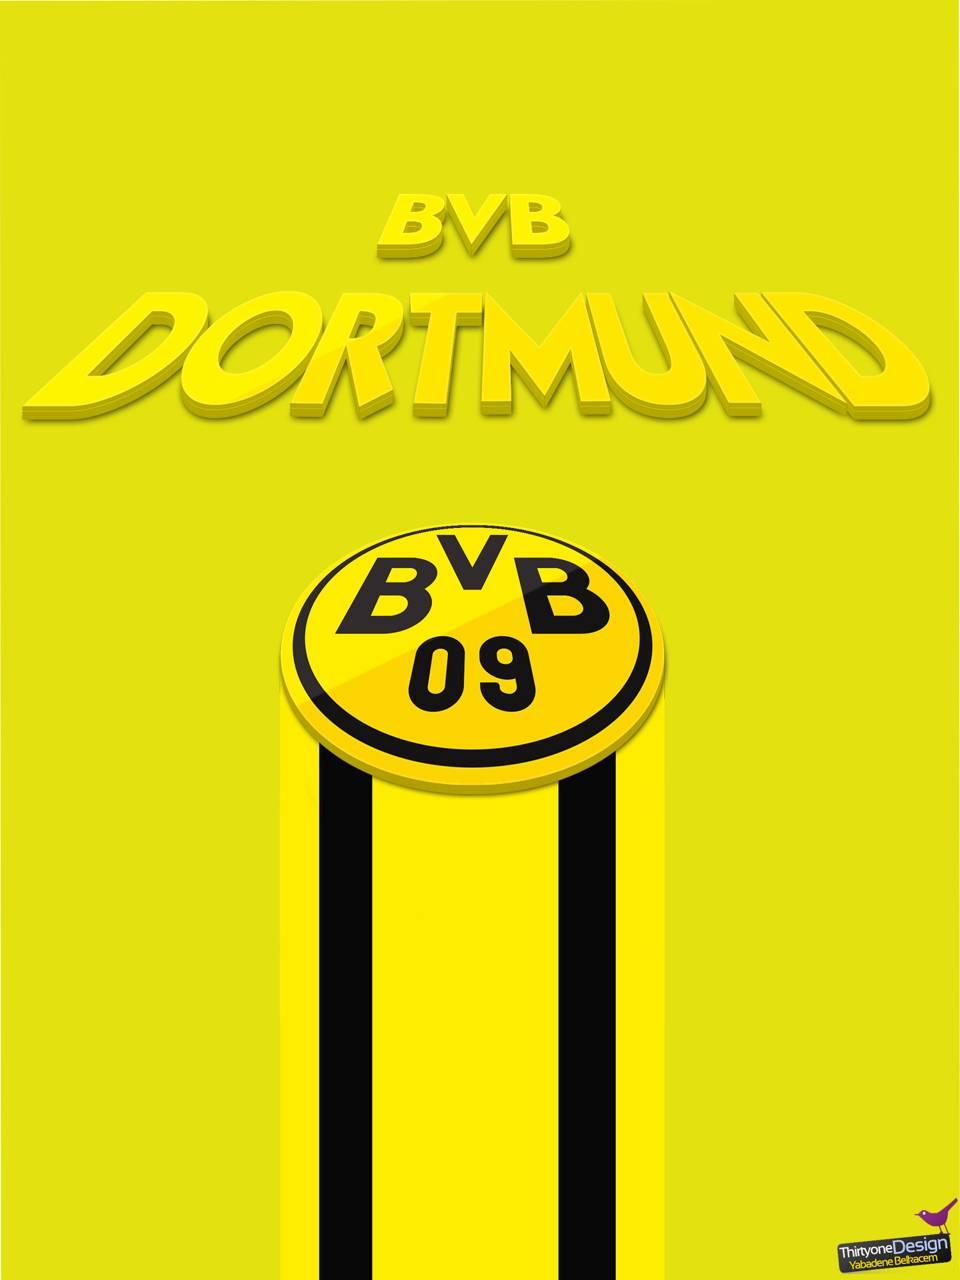 Bvb Dortmund Wallpaper By Belkacemyabadene 11 Free On Zedge